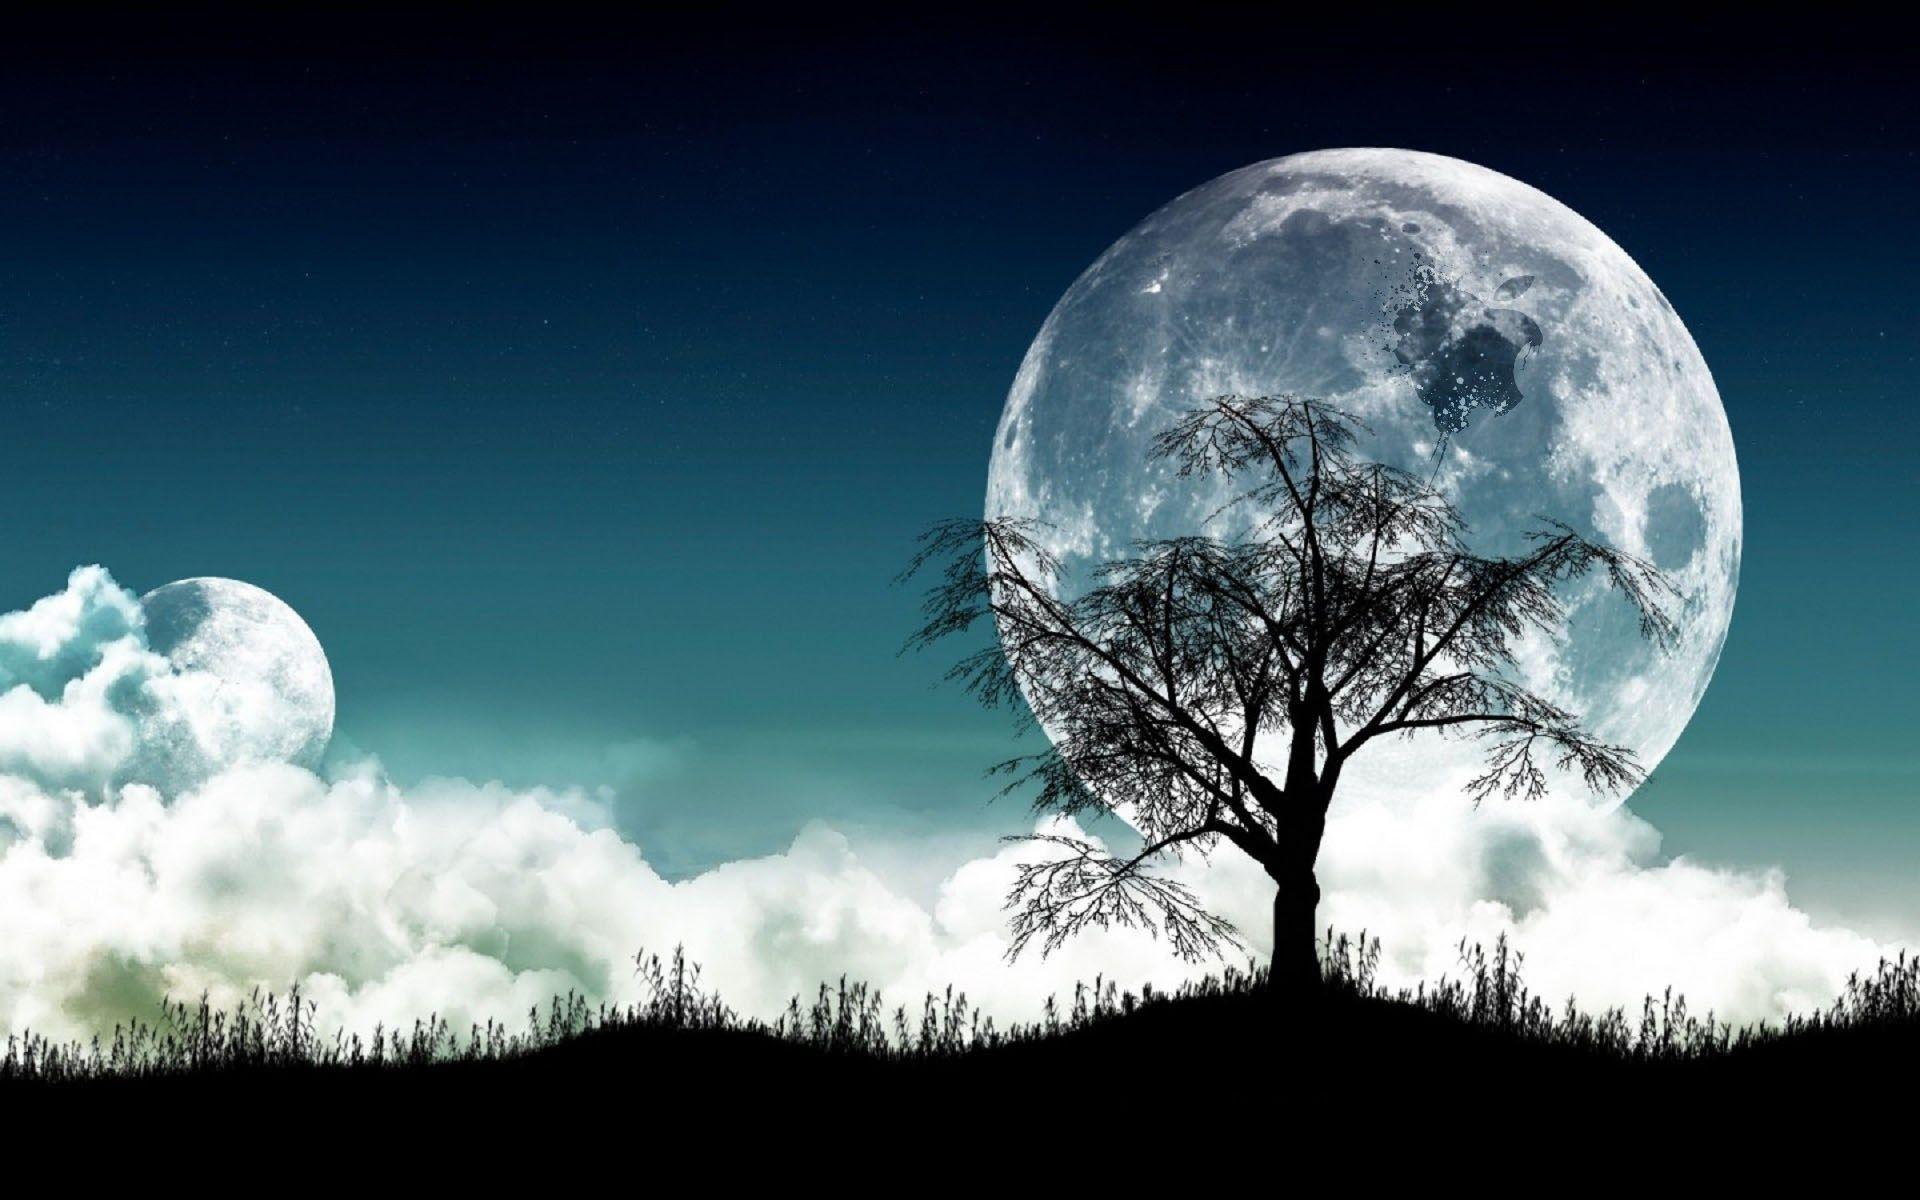 3d Night Moon Desktop Background Hd Wallpaper Images Hd Photoshop Landscape 3d Background